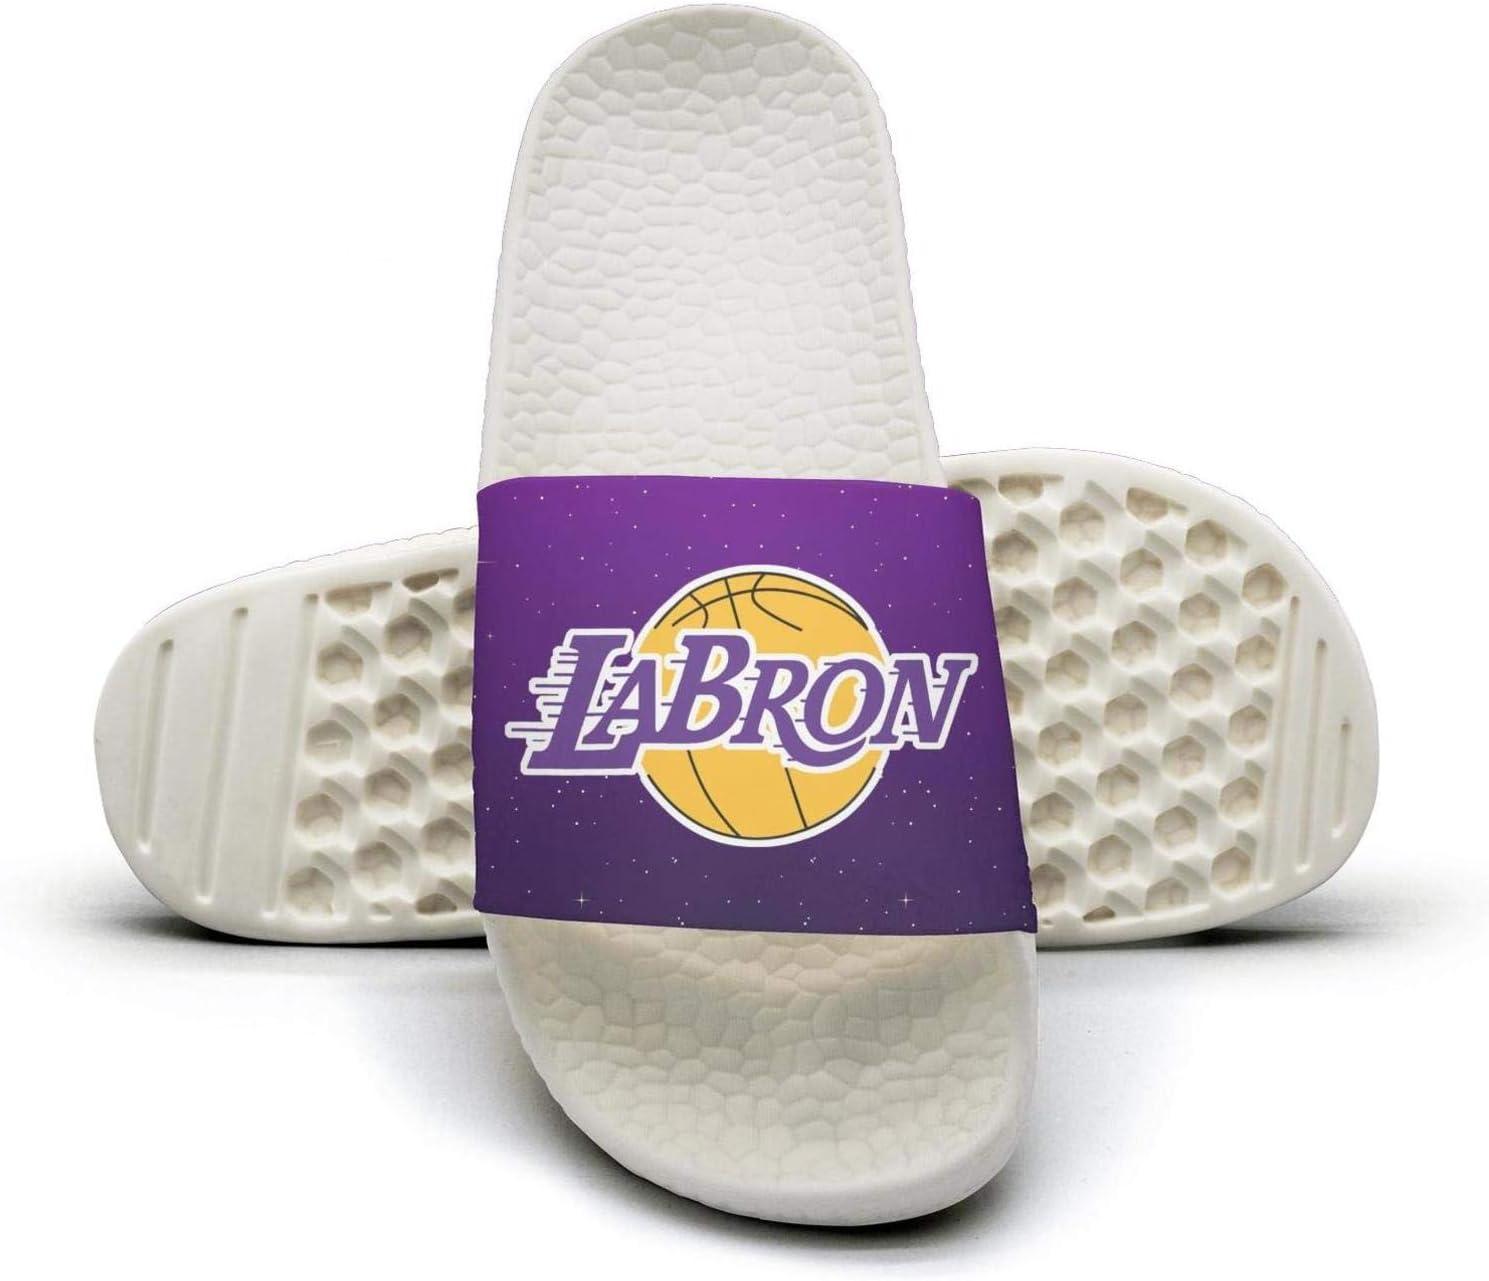 ADIDII Mens Printed Non-Slip Slipper Slides flip Flop Sandals La/_Bron/_Yellow/_Logo/_Basketball Summer Outdoors